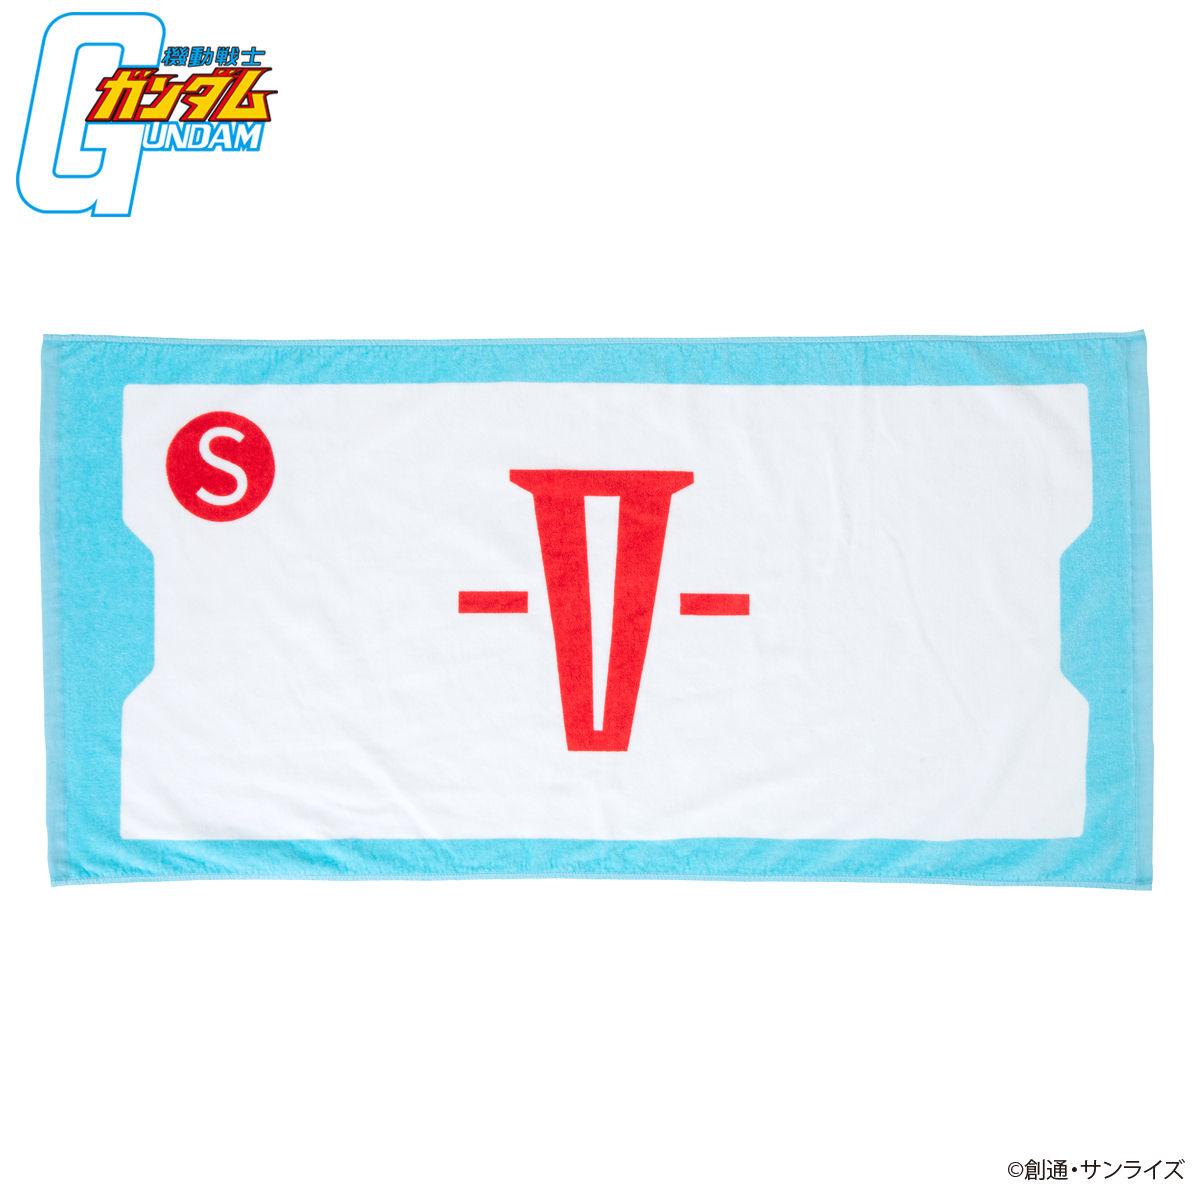 Mobile Suit Gundam Operation V Bath Towel